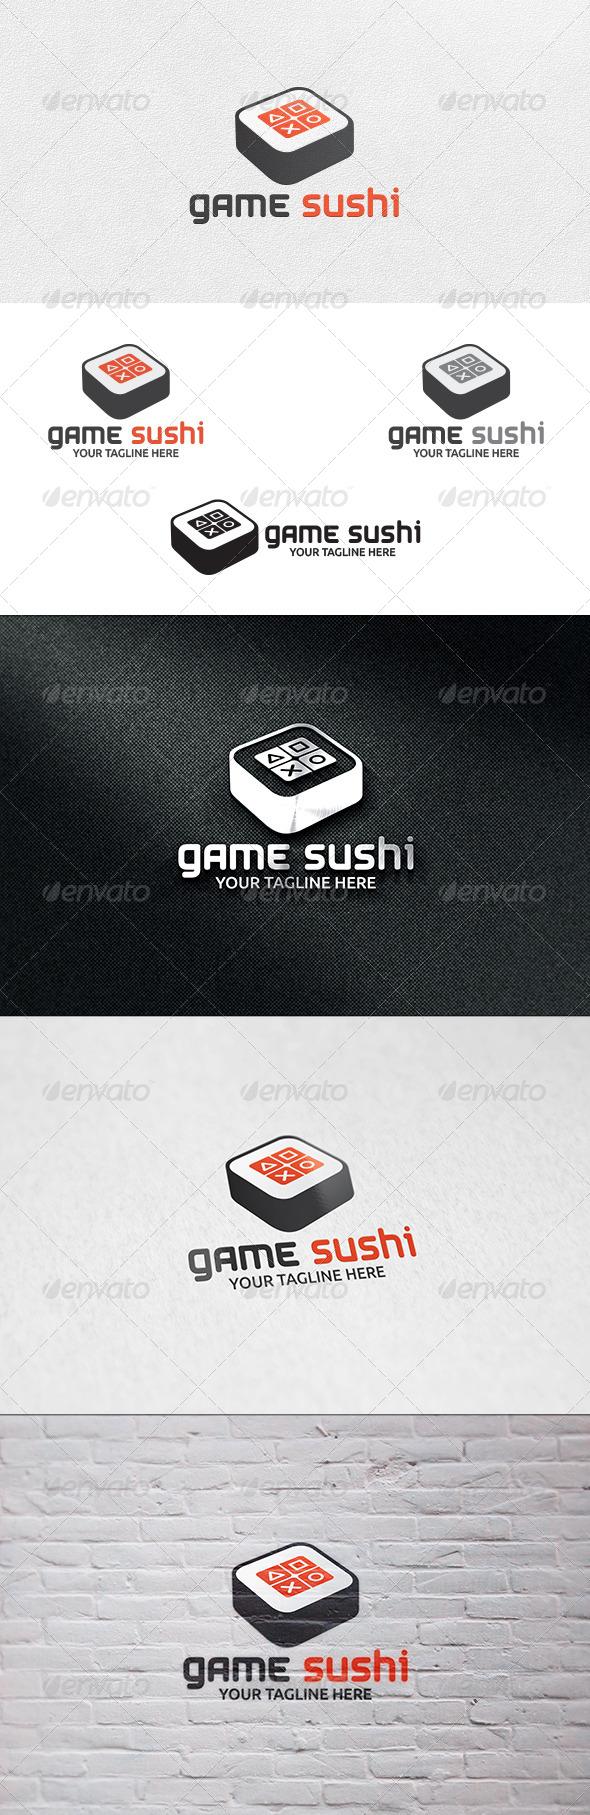 Game Sushi - Logo Template - Food Logo Templates